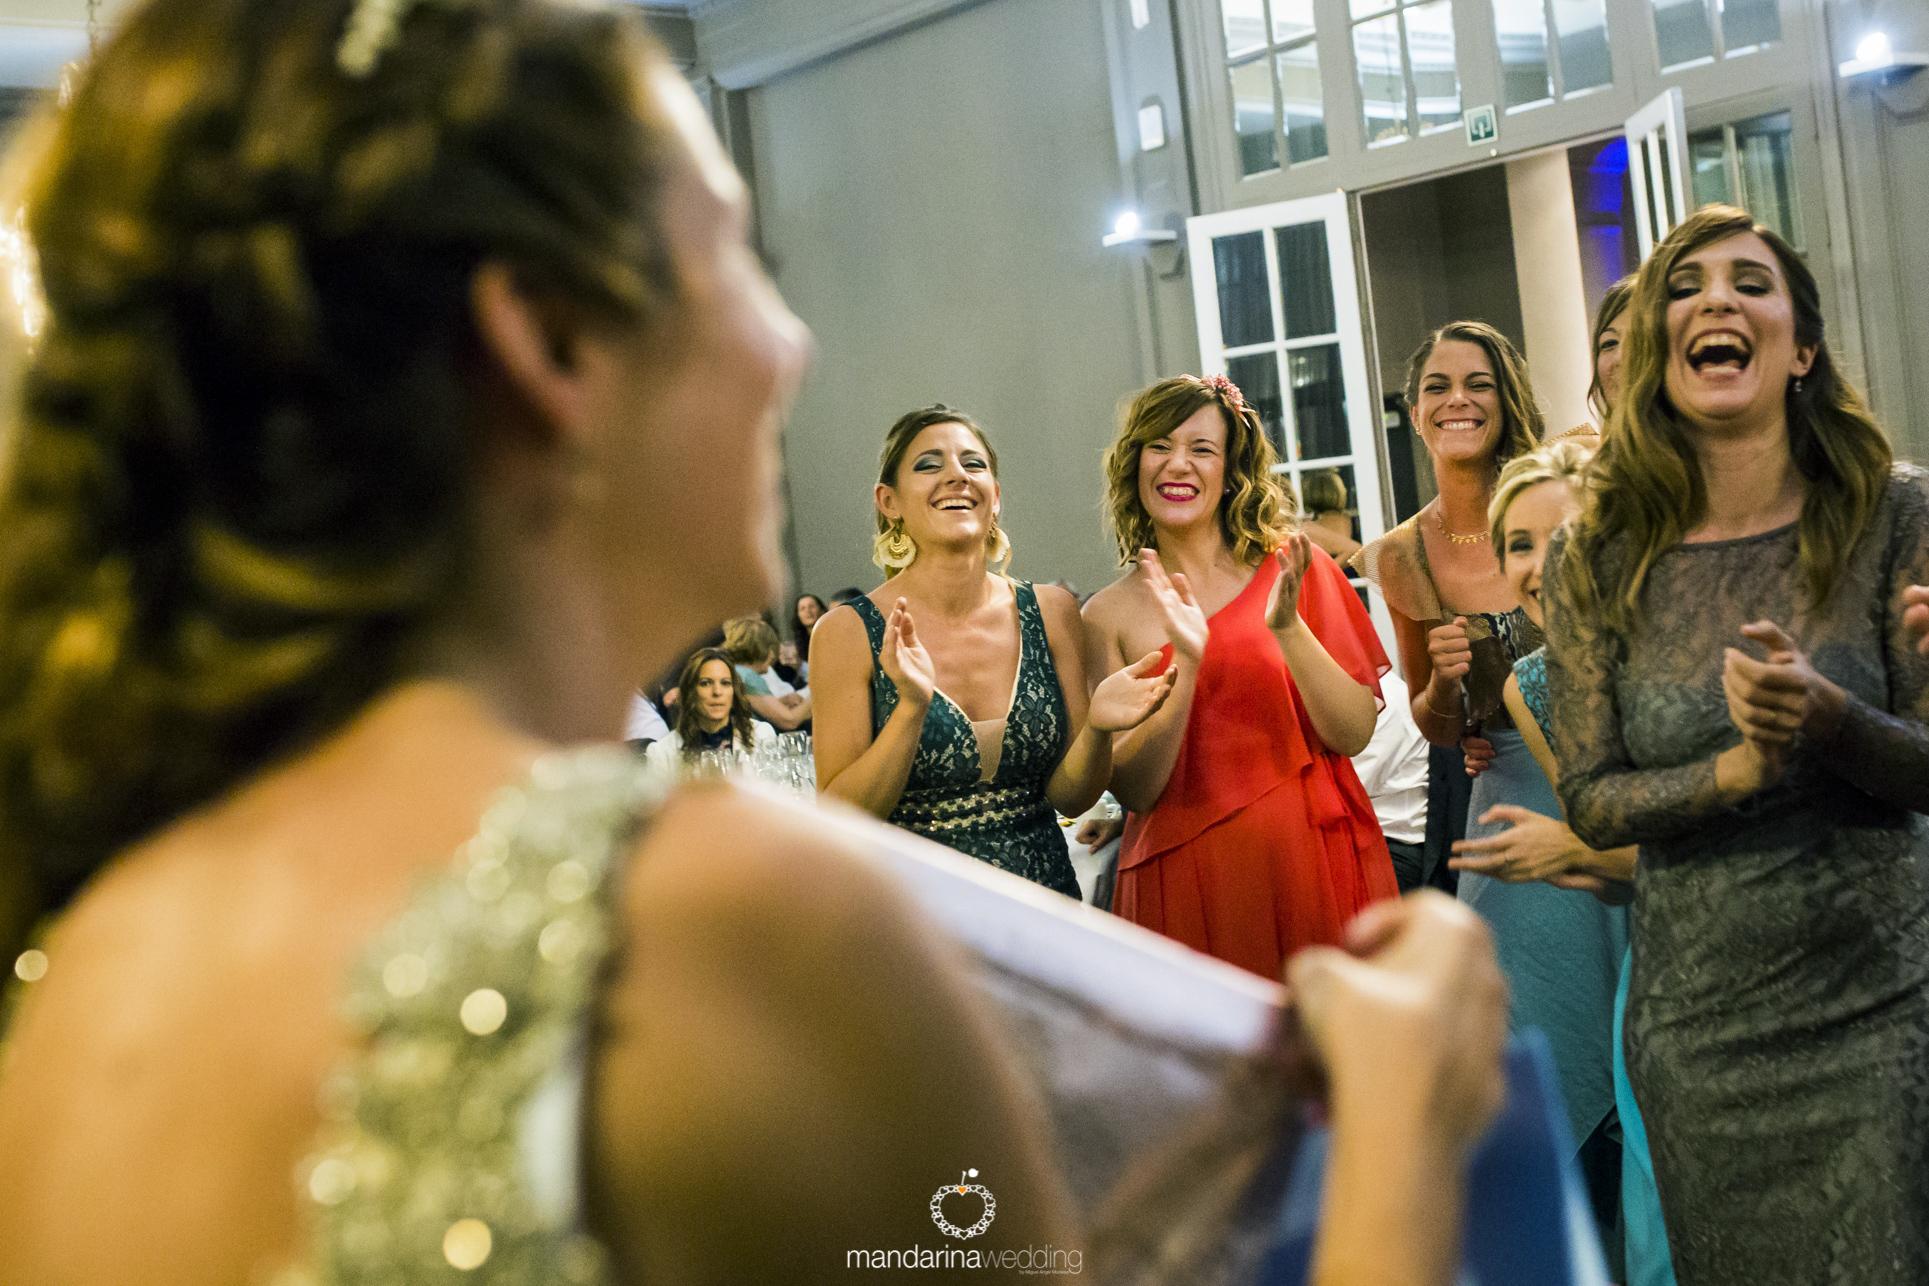 mandarina wedding, fotografo boda pais vasco, fotografo boda zaragoza, fotógrafo boda soria, fotografo boda Madrid, fotógrafo boda tarragona-21